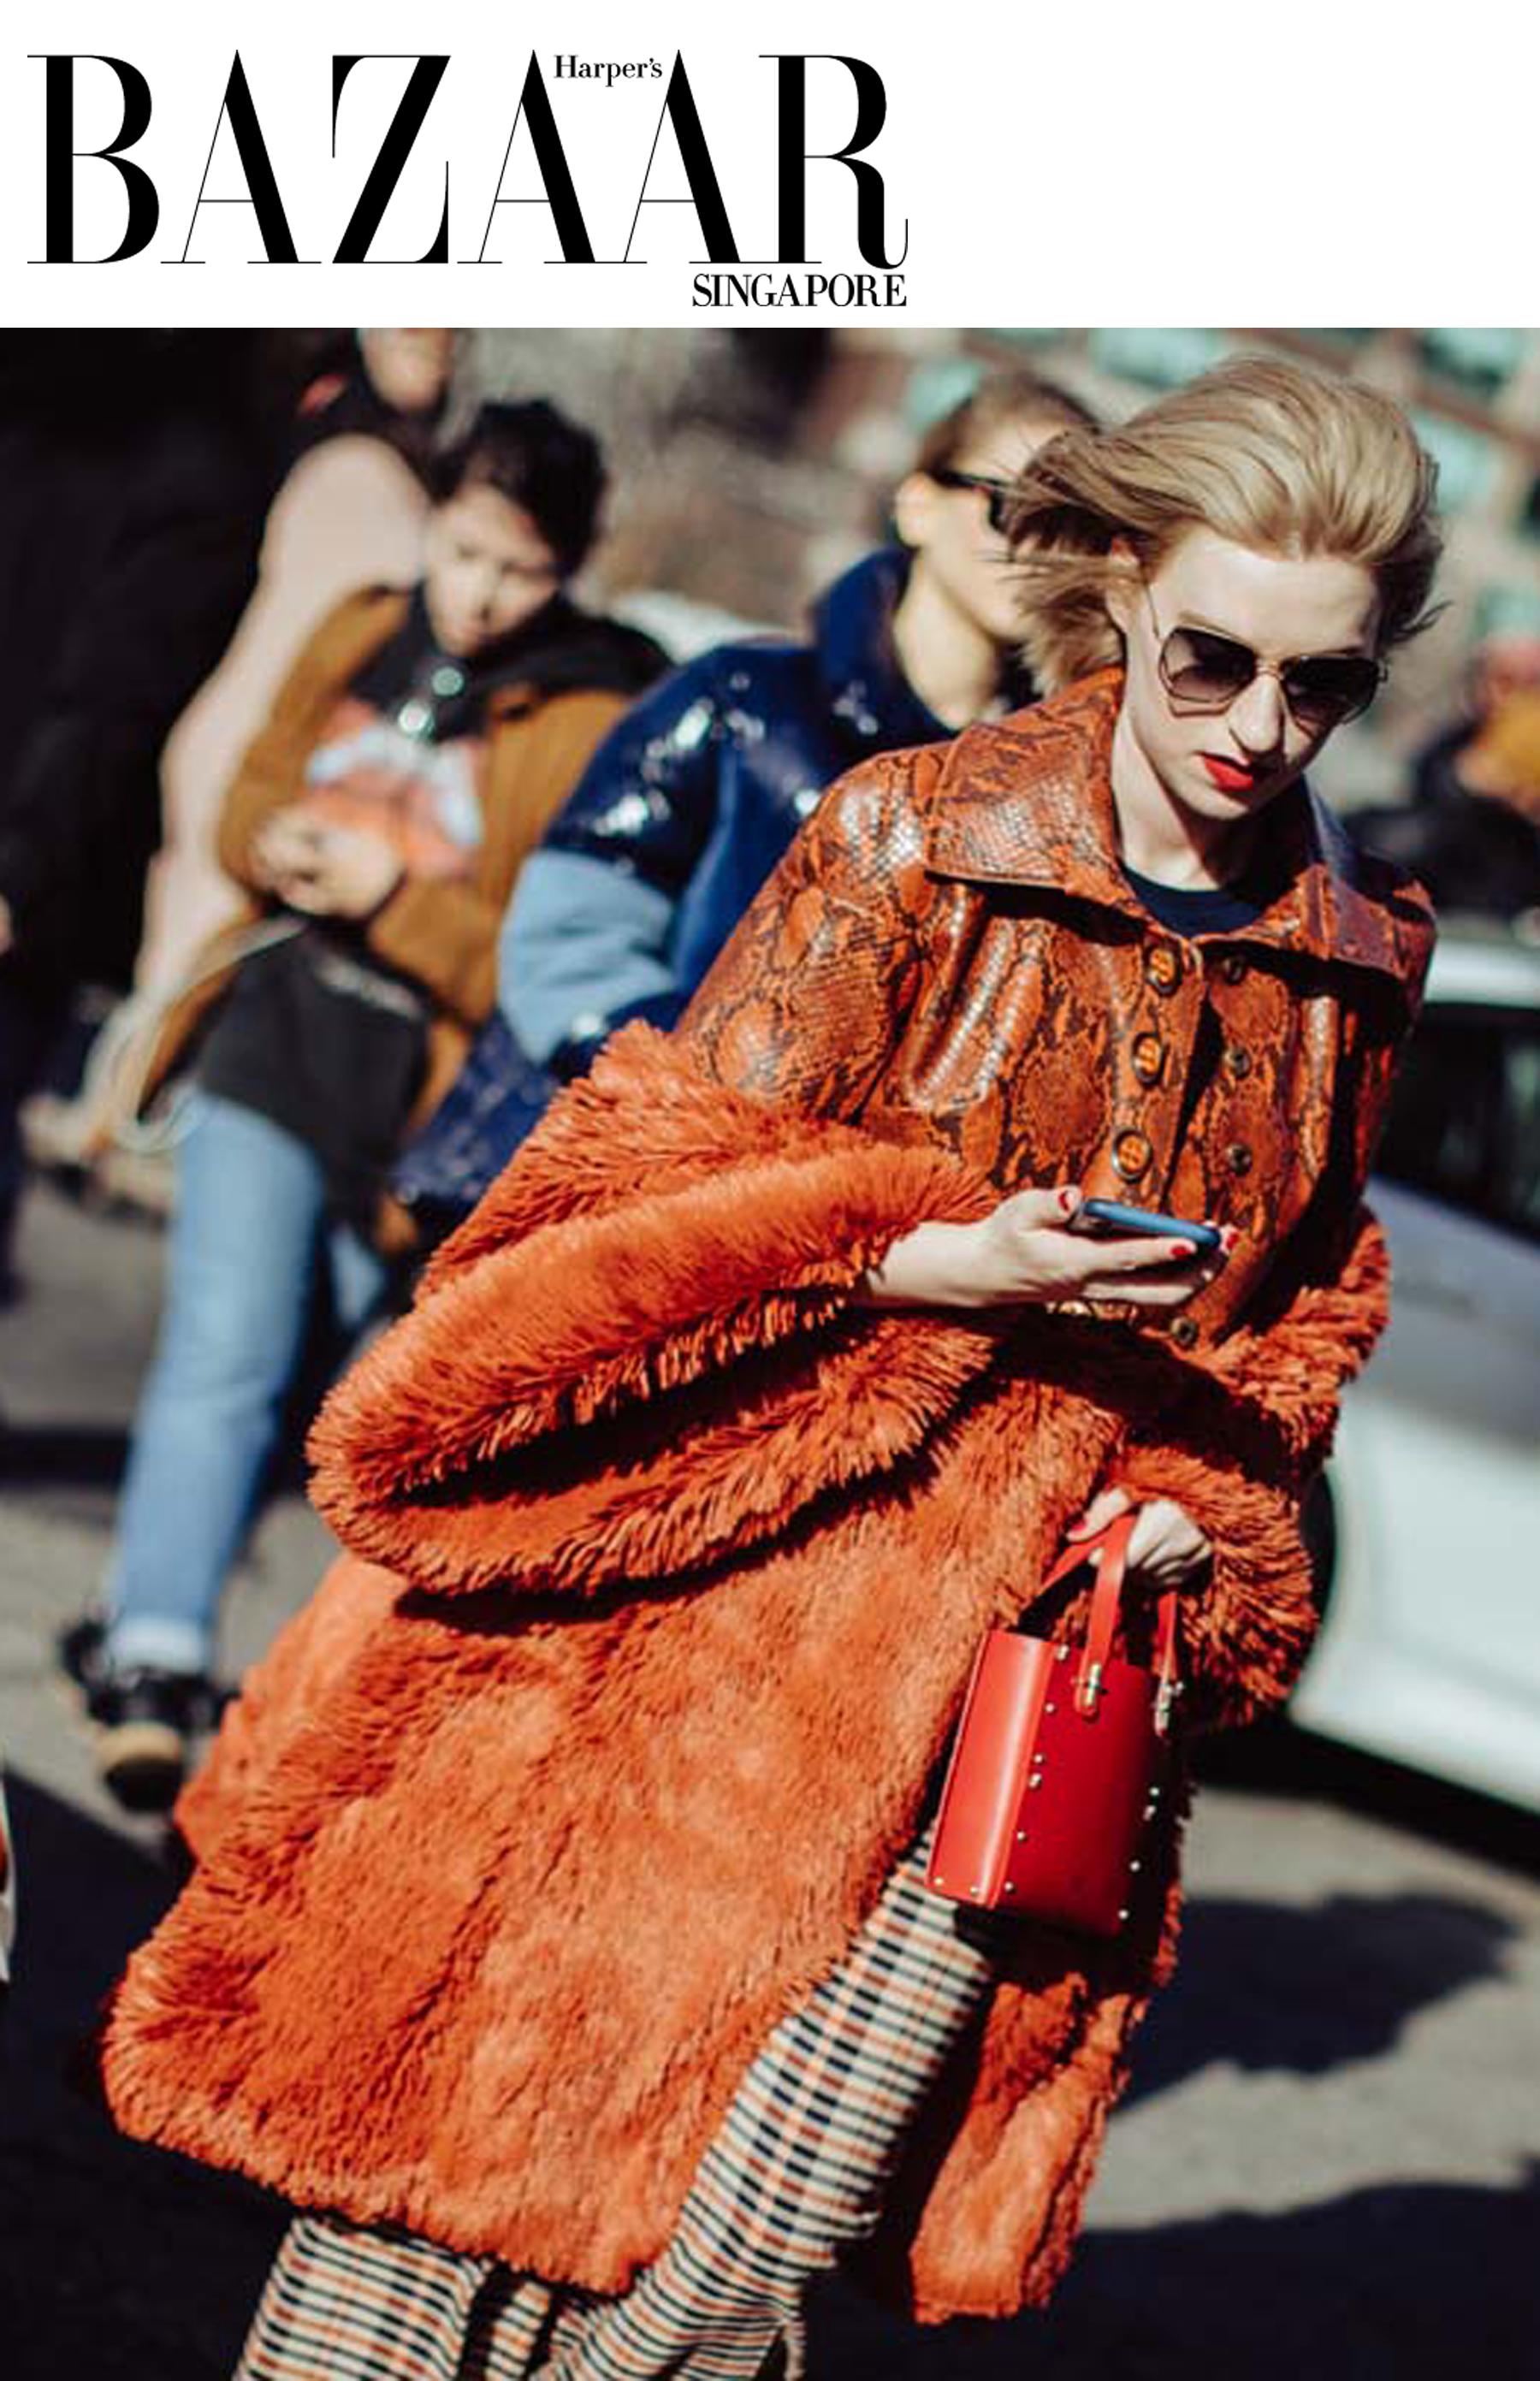 harper's bazaar nyfw new york fashion week